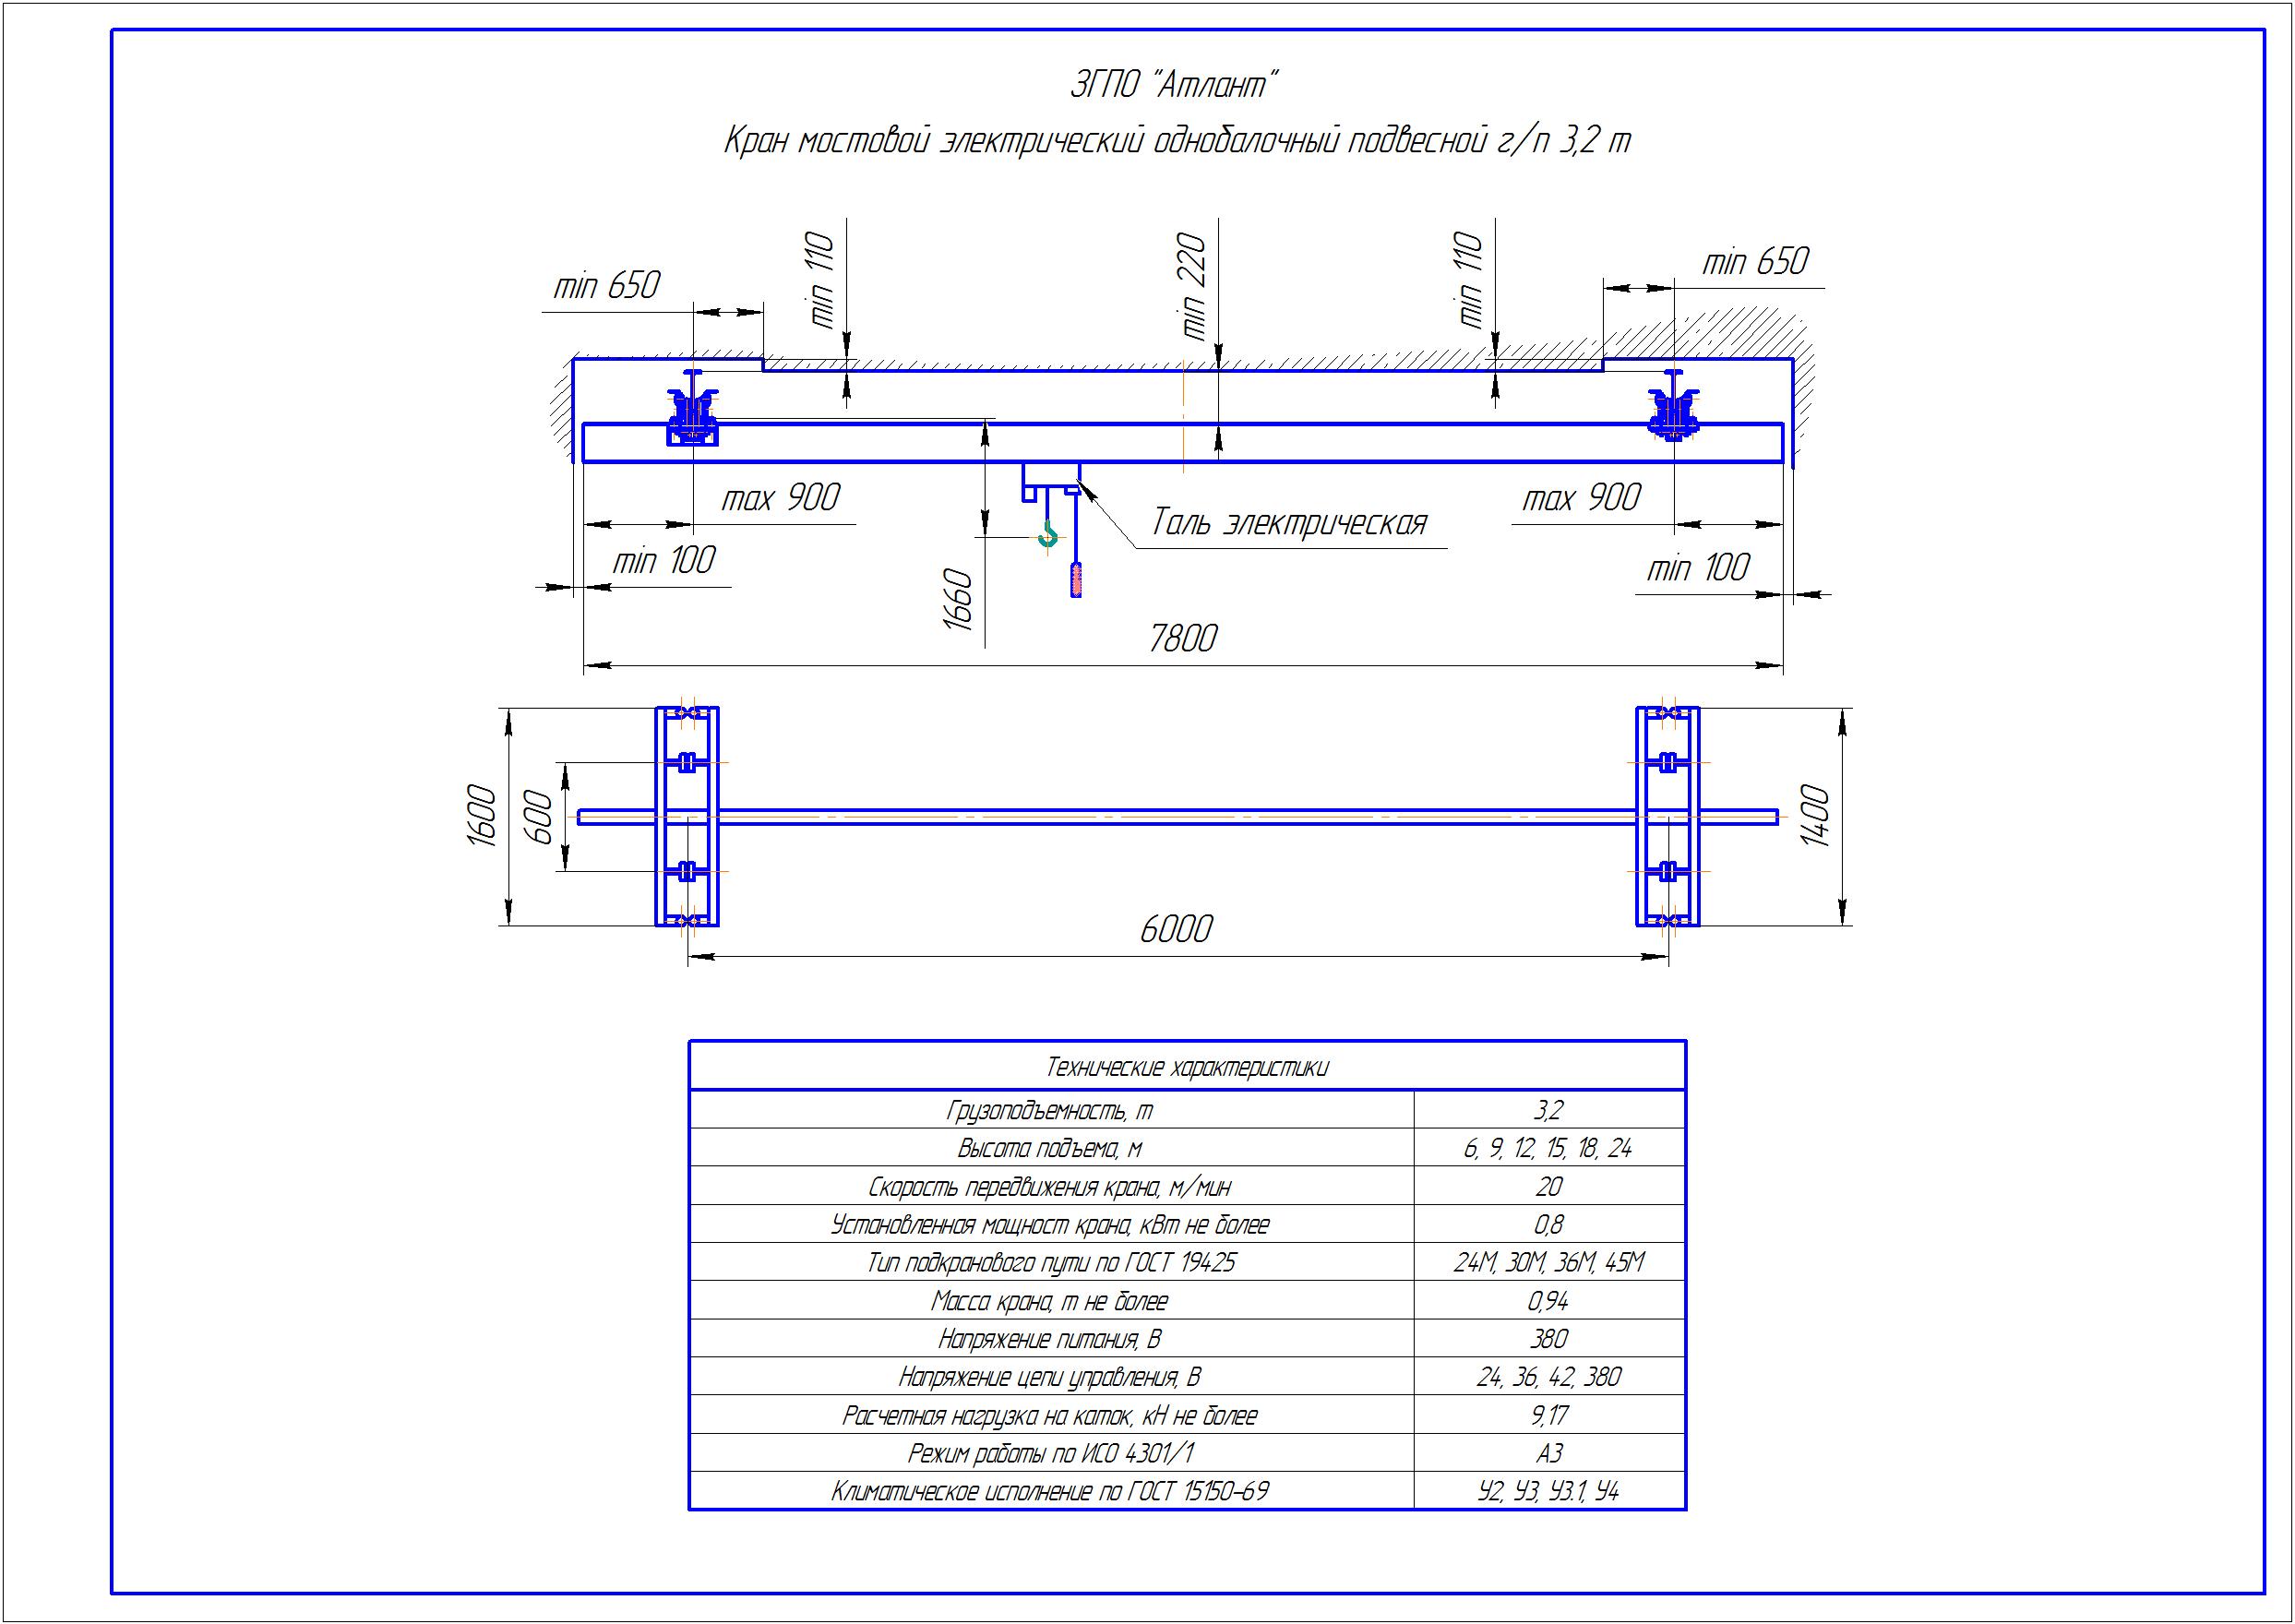 KBP 3 2 - Подвесная кран балка